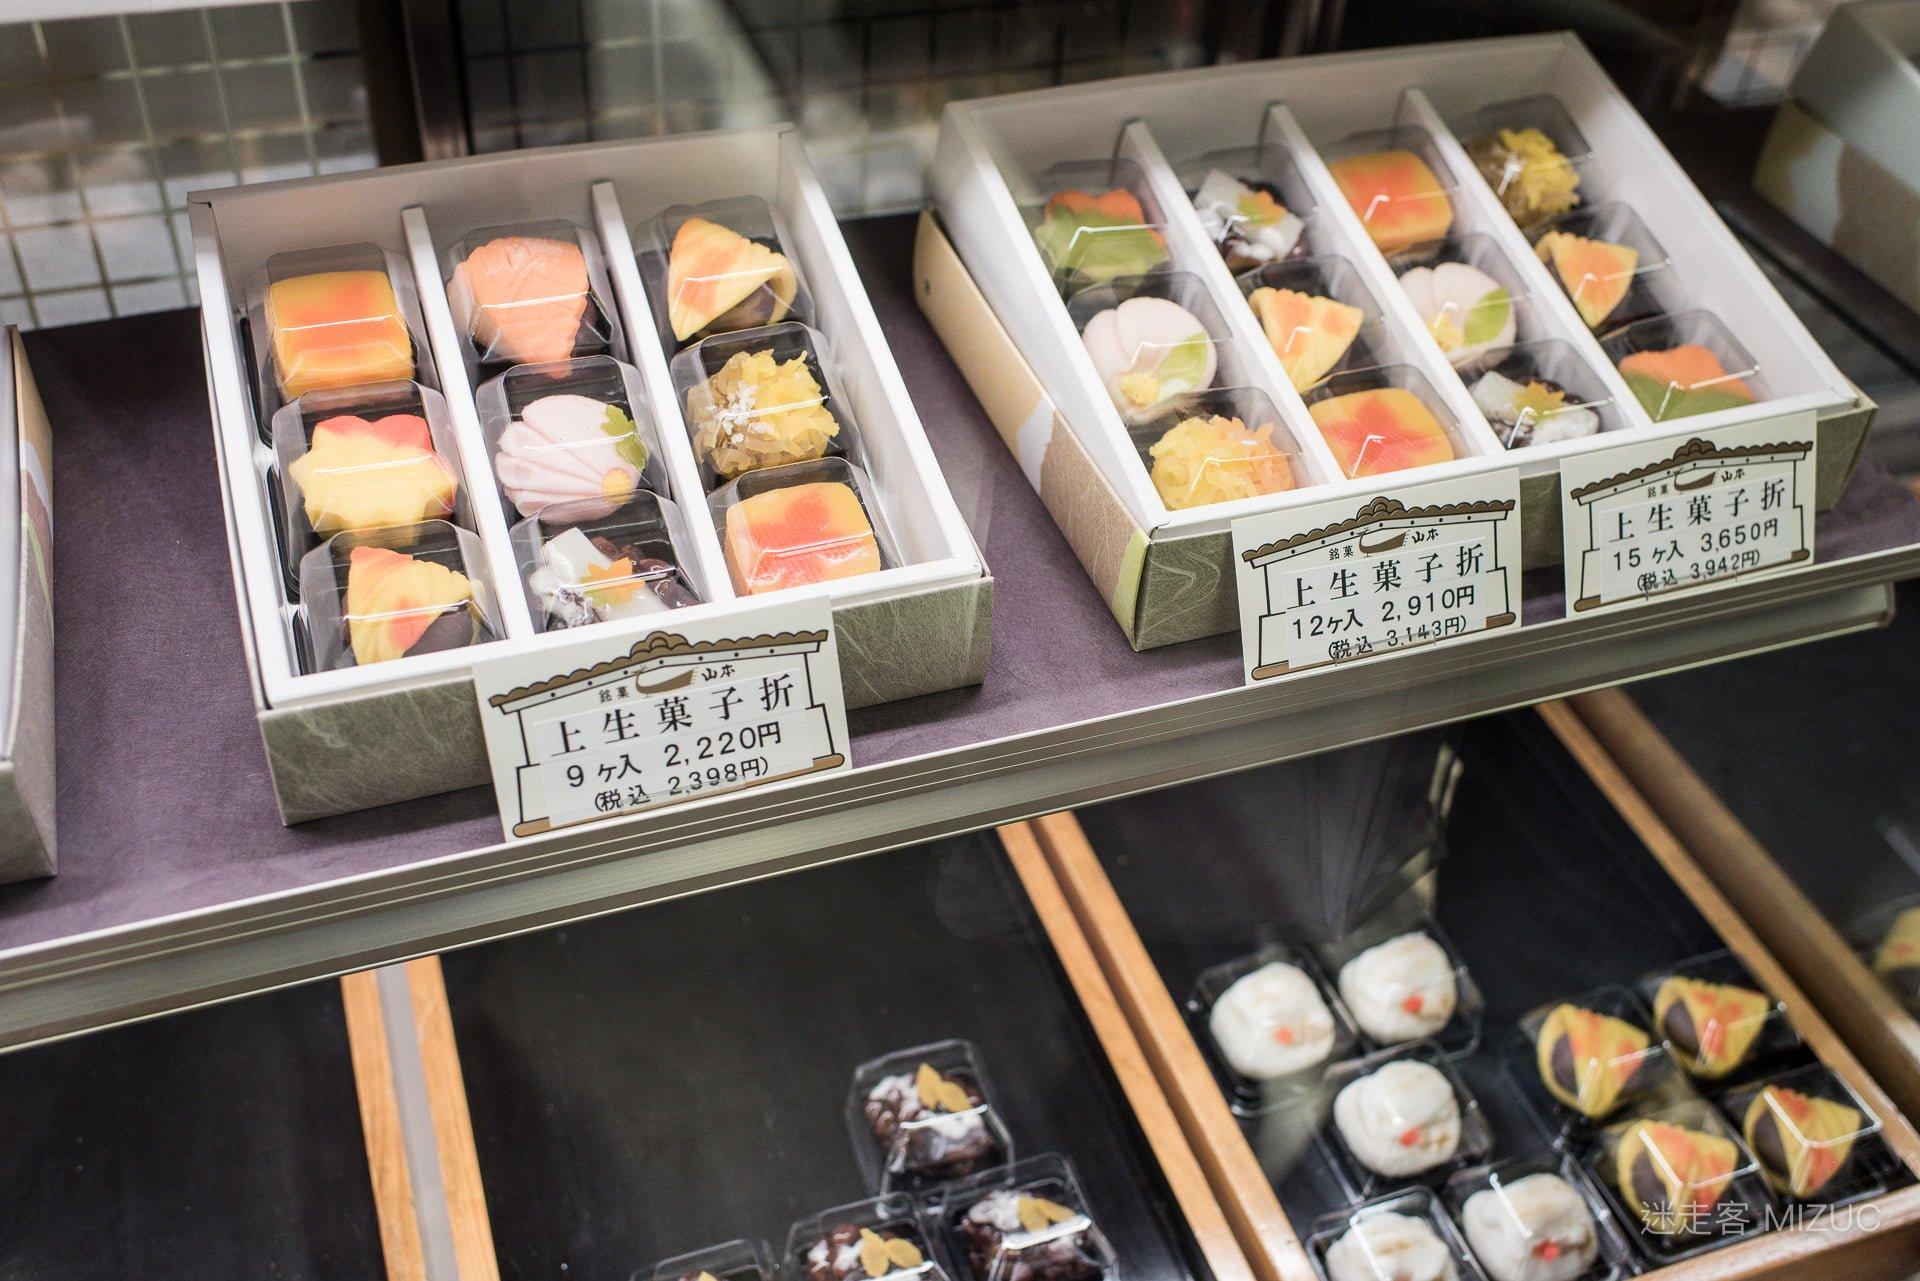 201711 Ibaraki Tochigi Gunma Japan Travel By RentalCar 66 日本自駕旅遊/北關東三縣「茨城、櫪木、群馬」秋天美食、溫泉與瀑布秘境百景(精選照片分享)